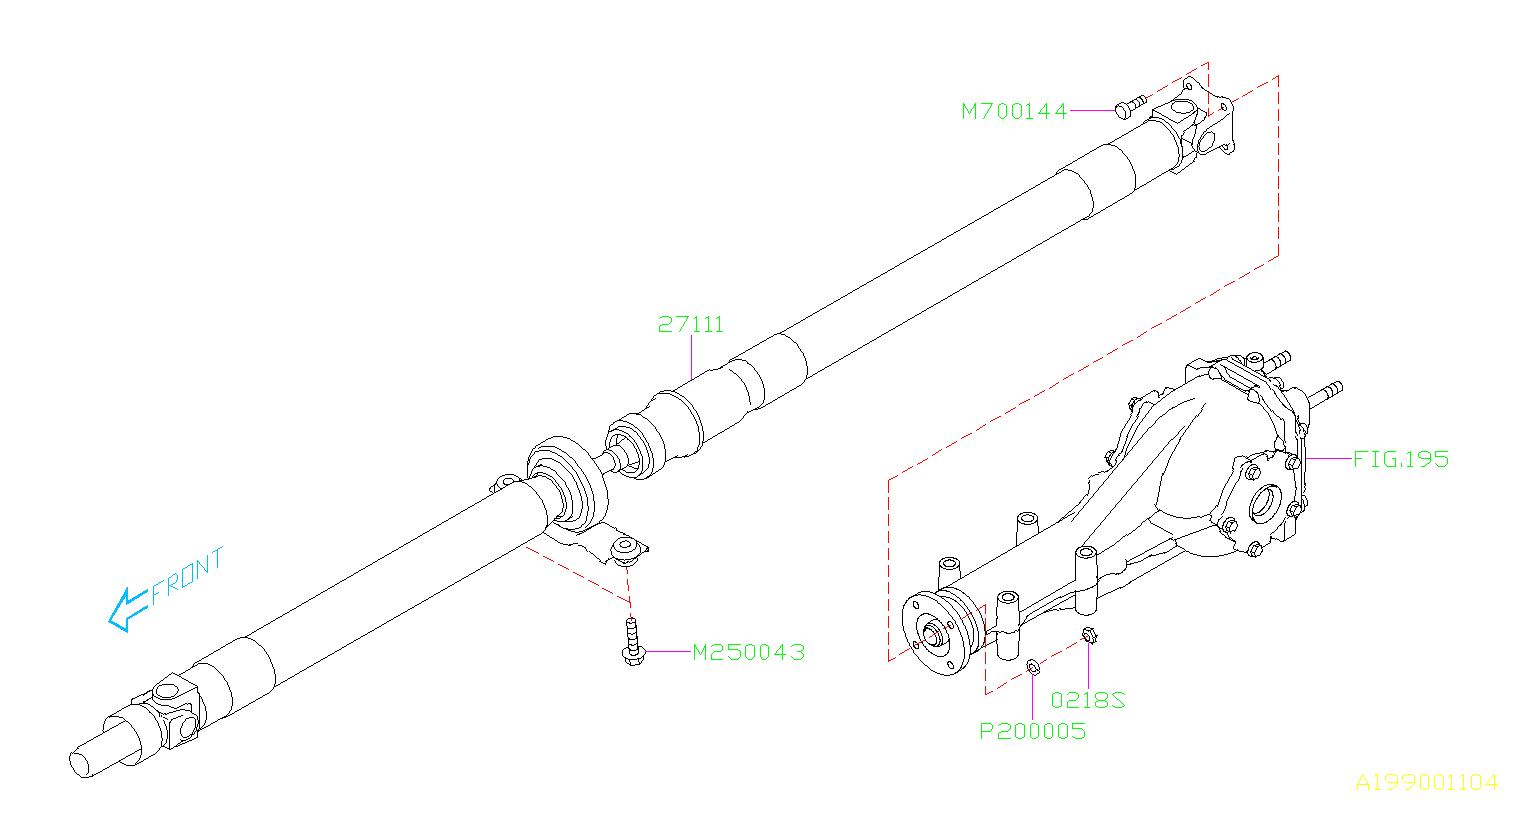 Subaru WRX Propeller shaft assembly. Driveline